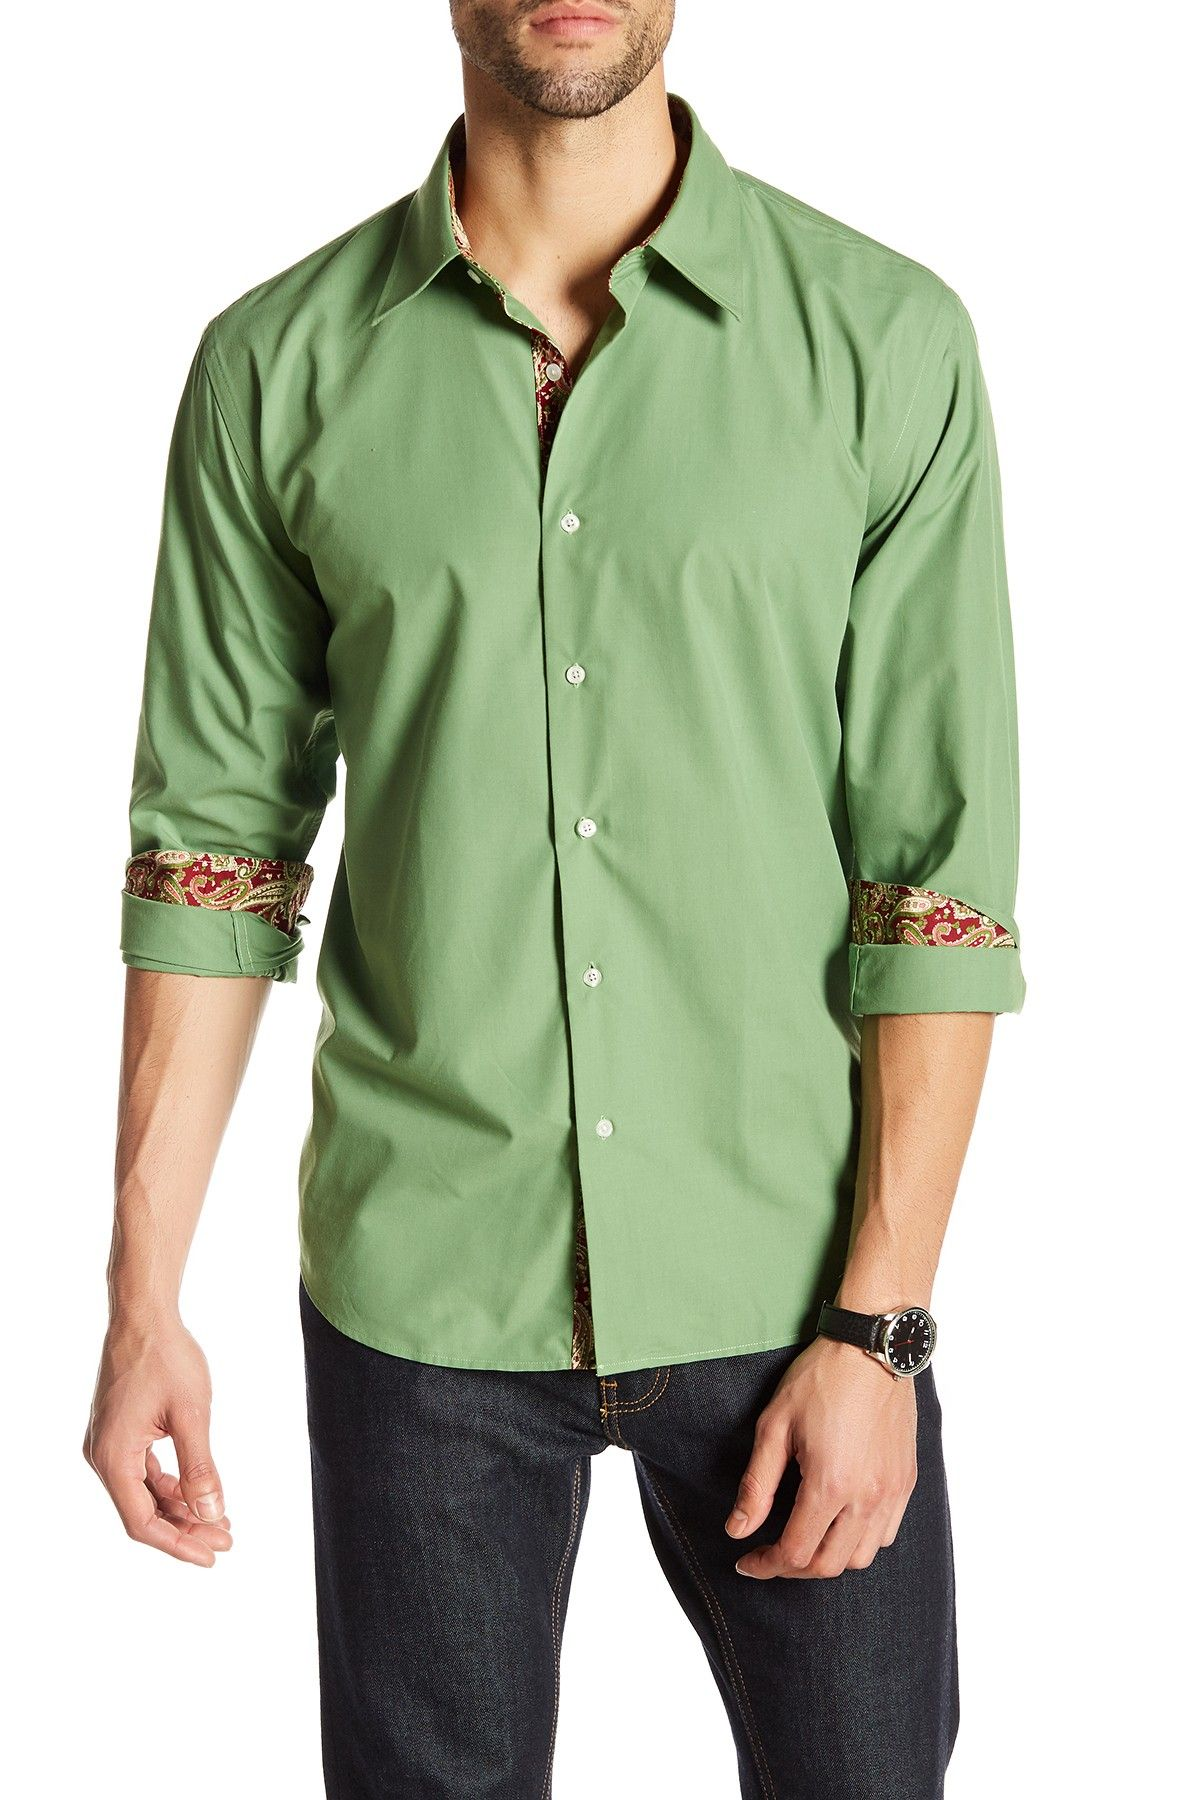 67c8feb47812d4 Jordan Jasper Roger Long Sleeve Contrast Interior Trim Fit Shirt ...